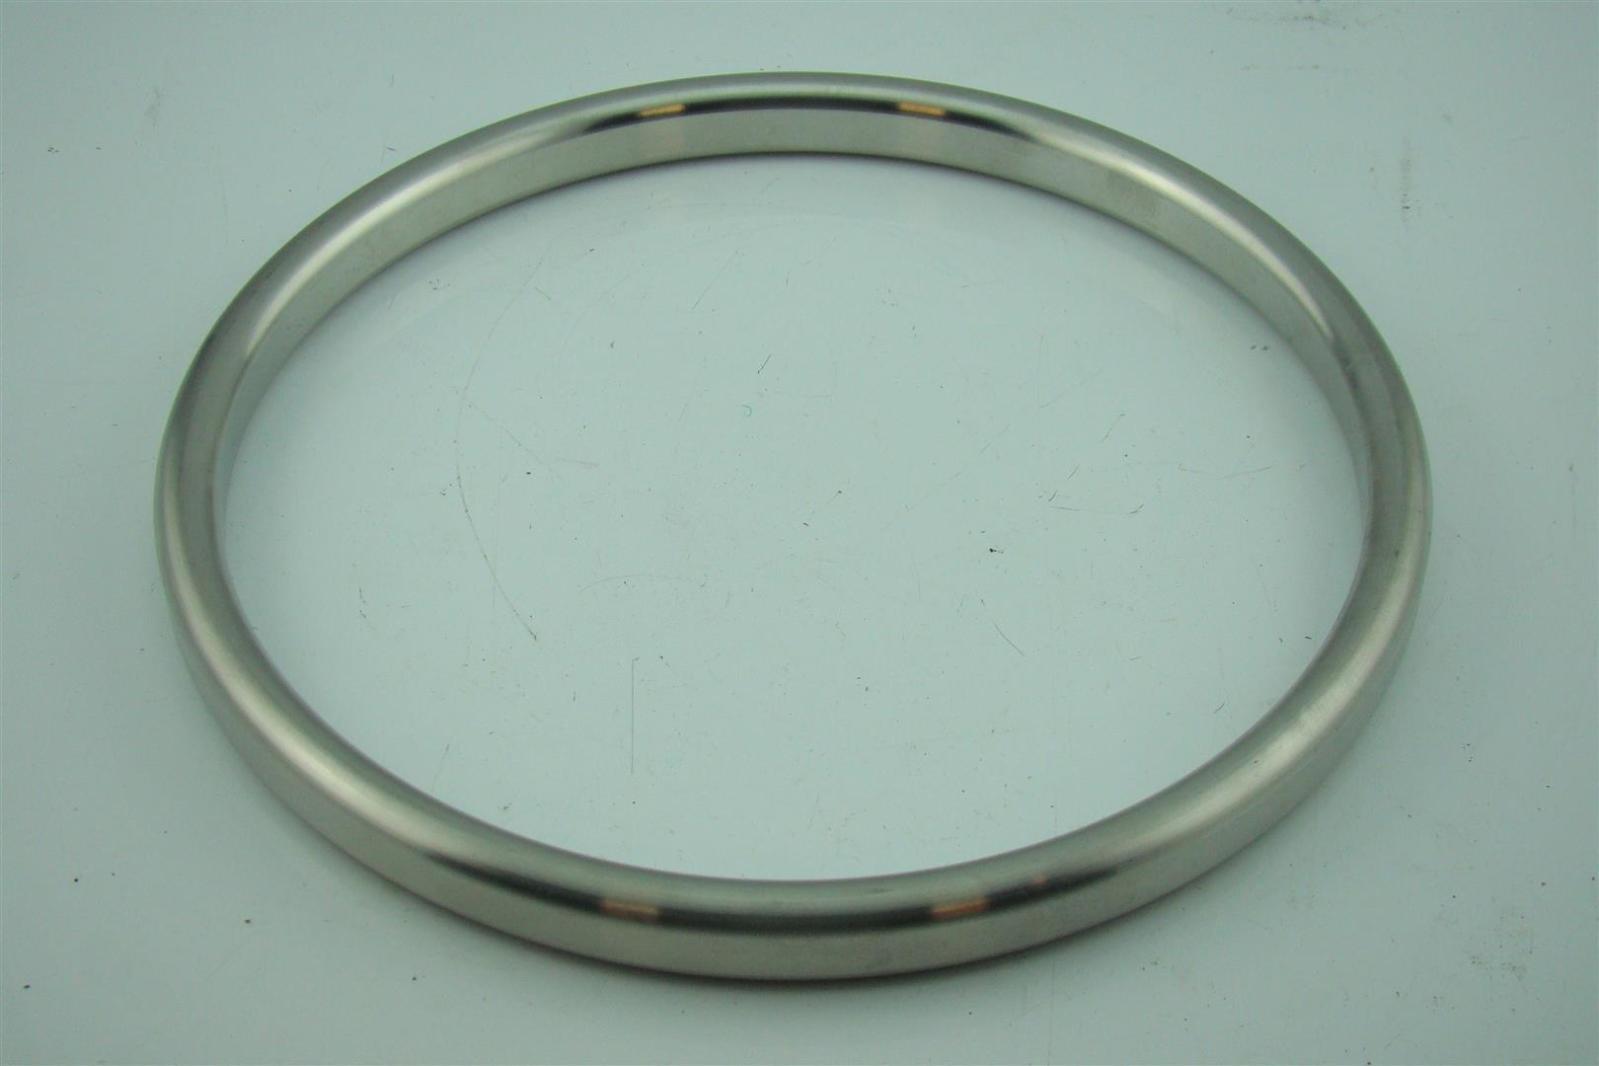 Sara-Sae Ring joint gasket S316-4 6A-0322 R-45   eBay